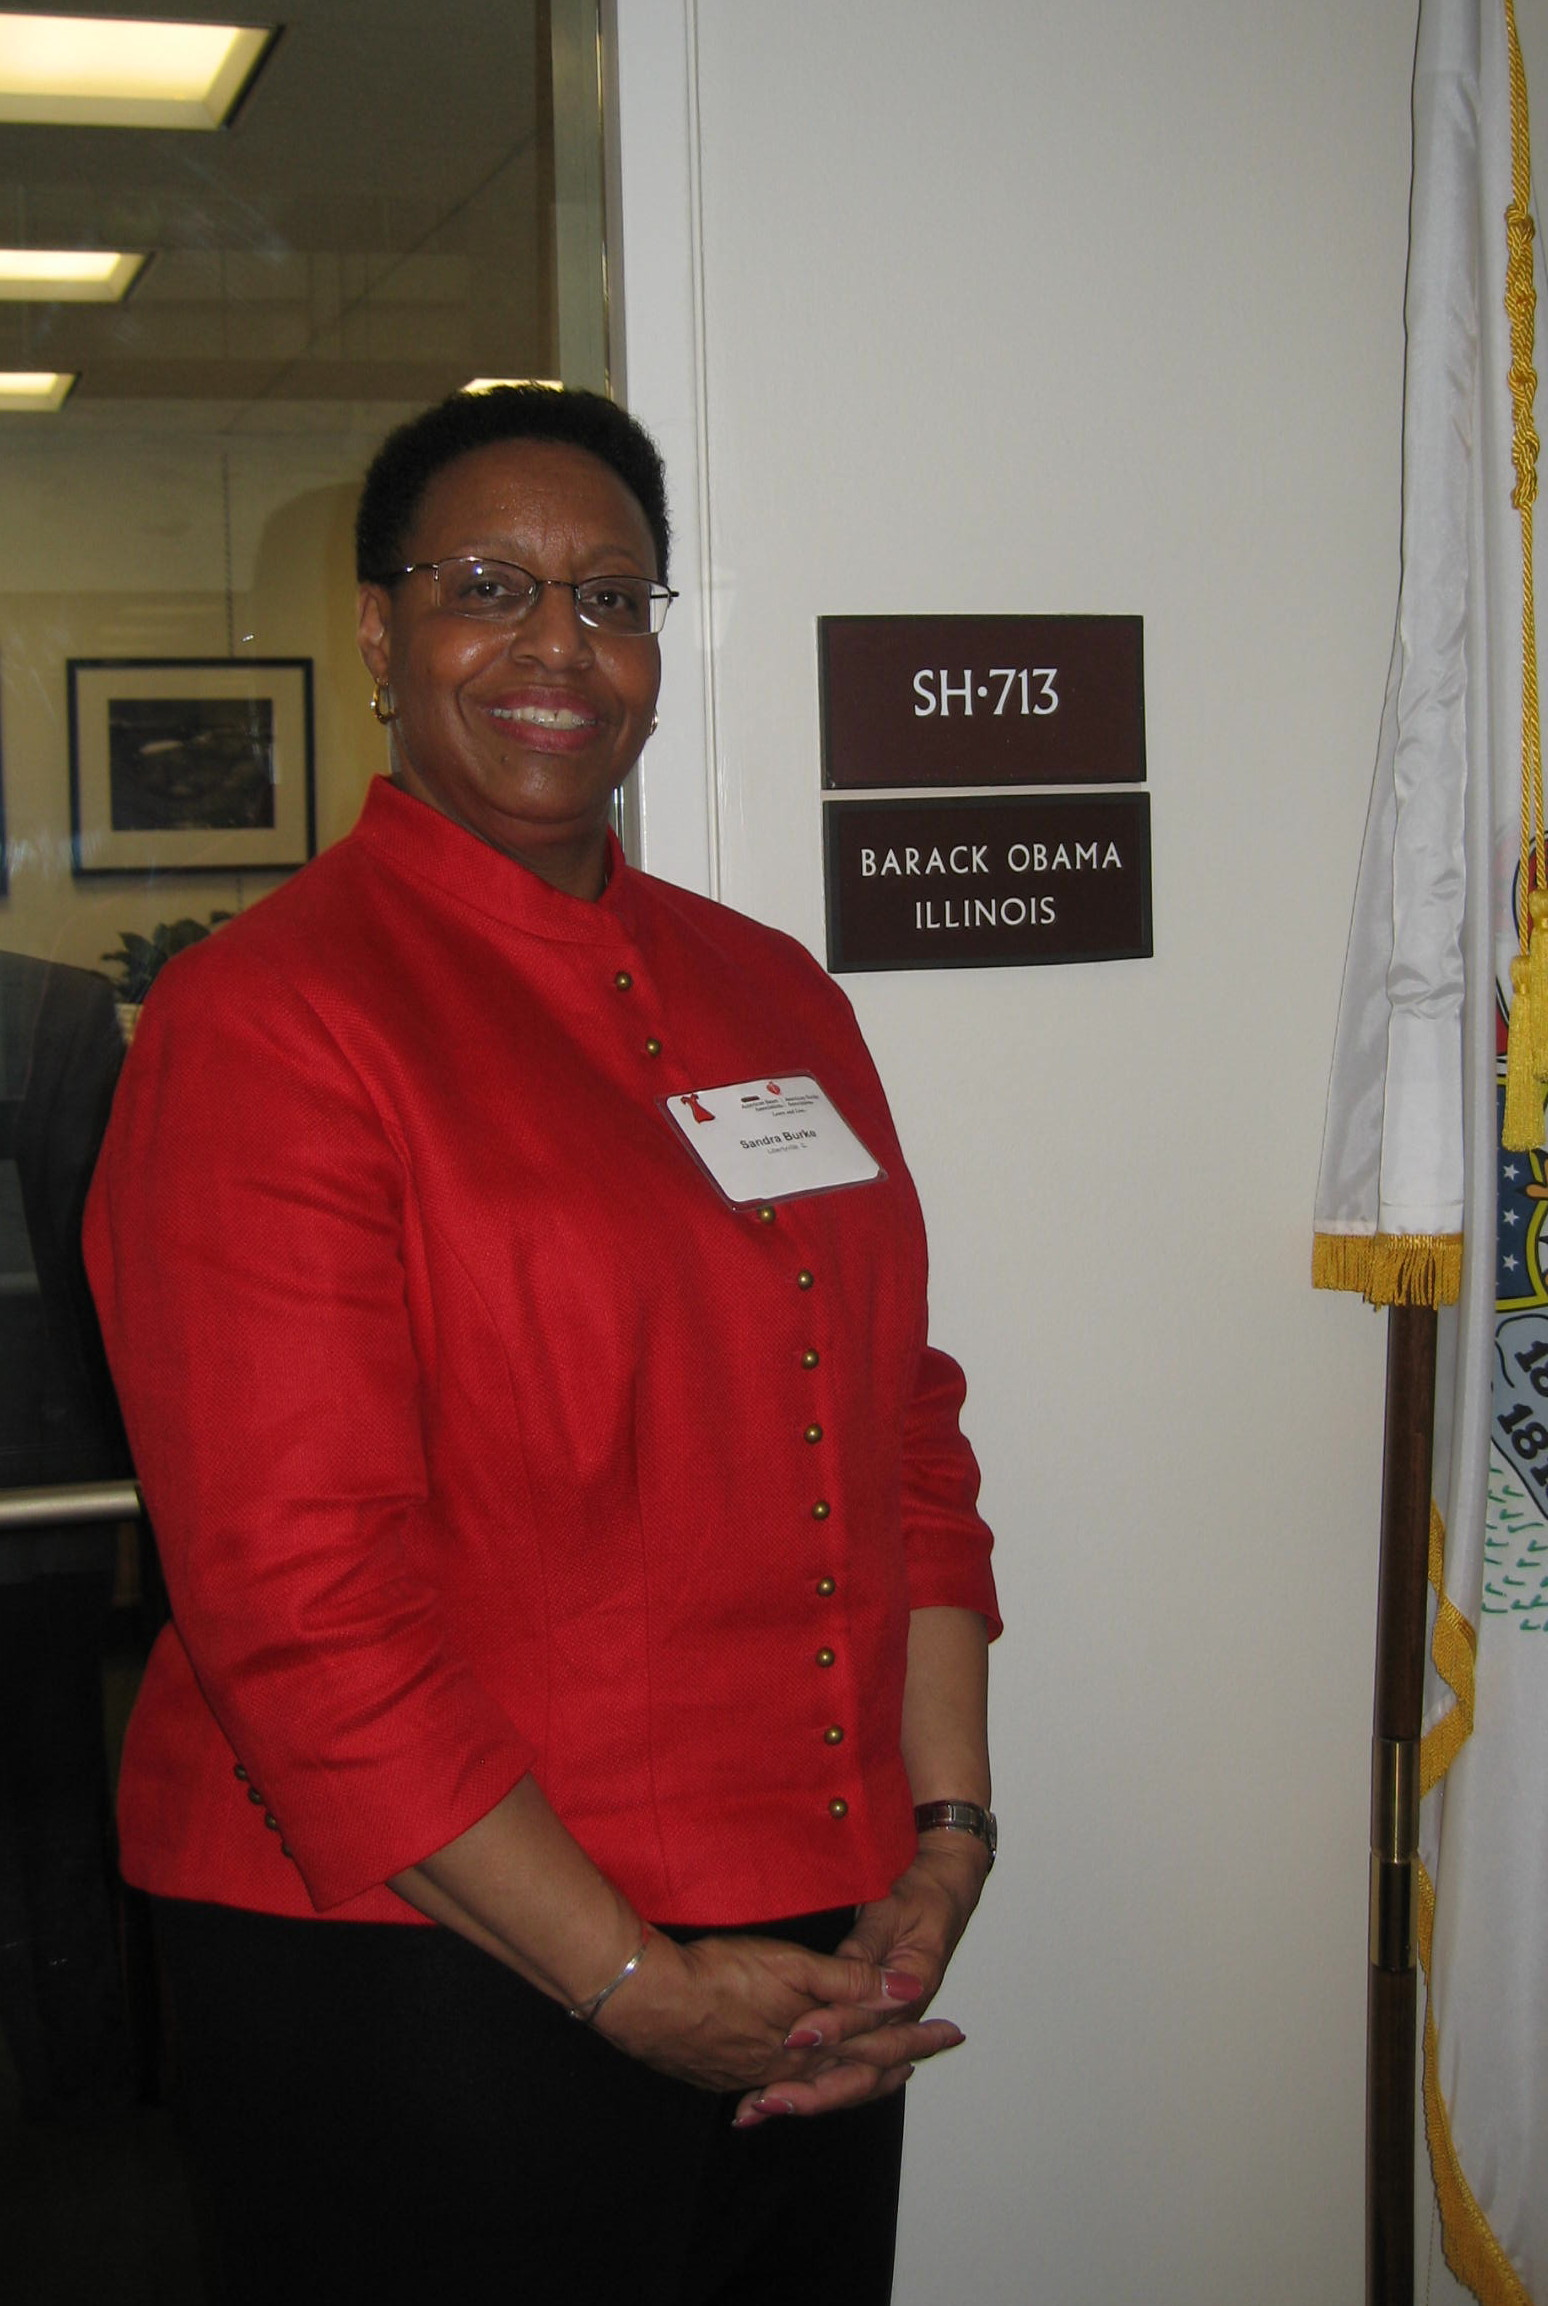 Visiting Barack Obama's Senate Office, 2006.jpg